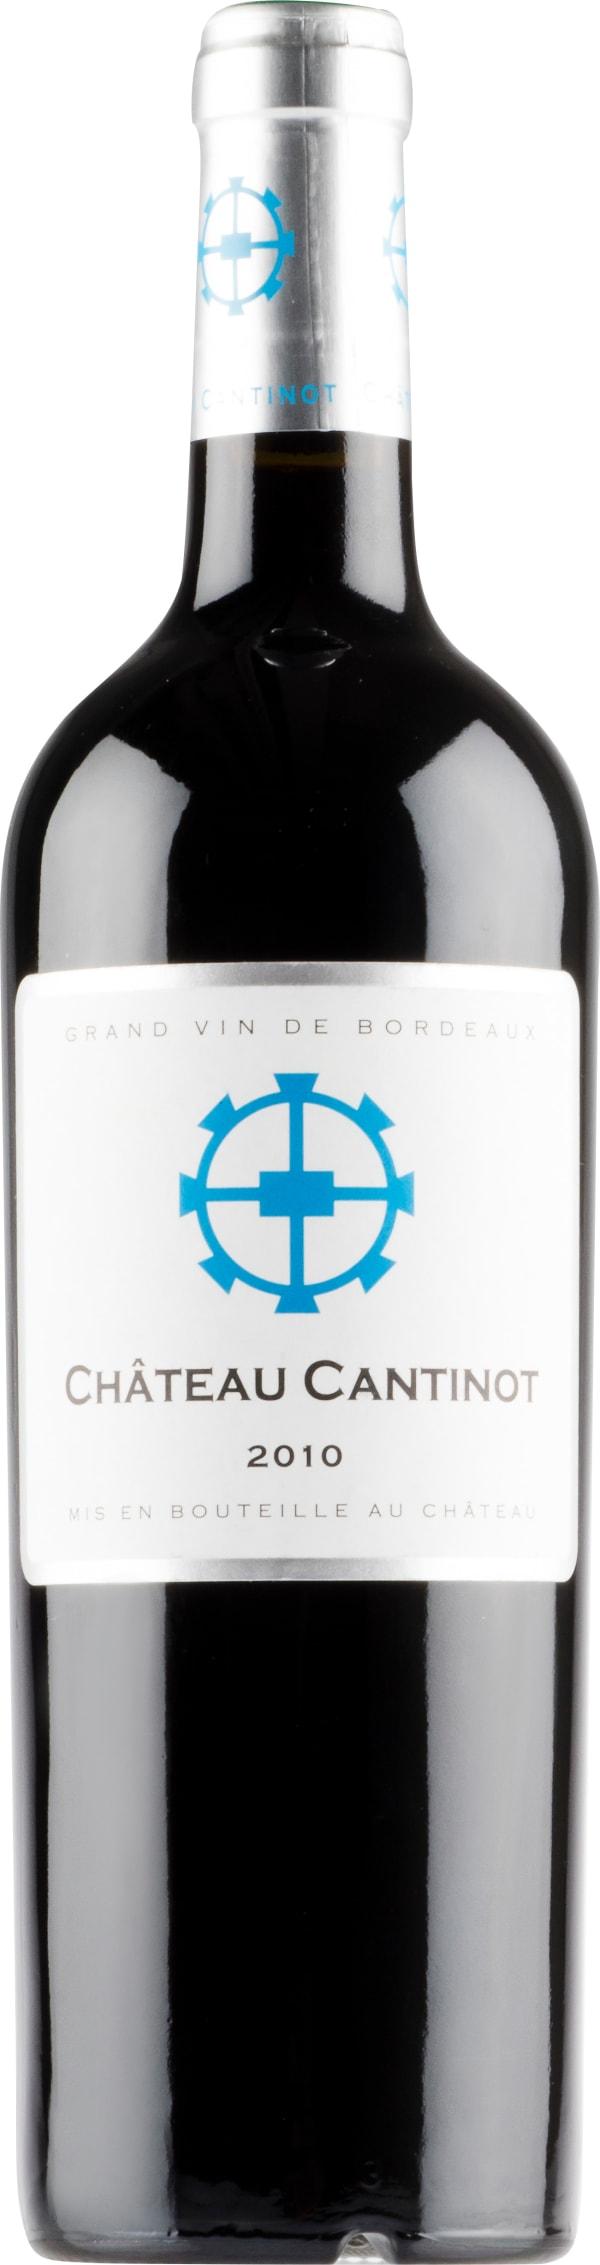 Château Cantinot 2010